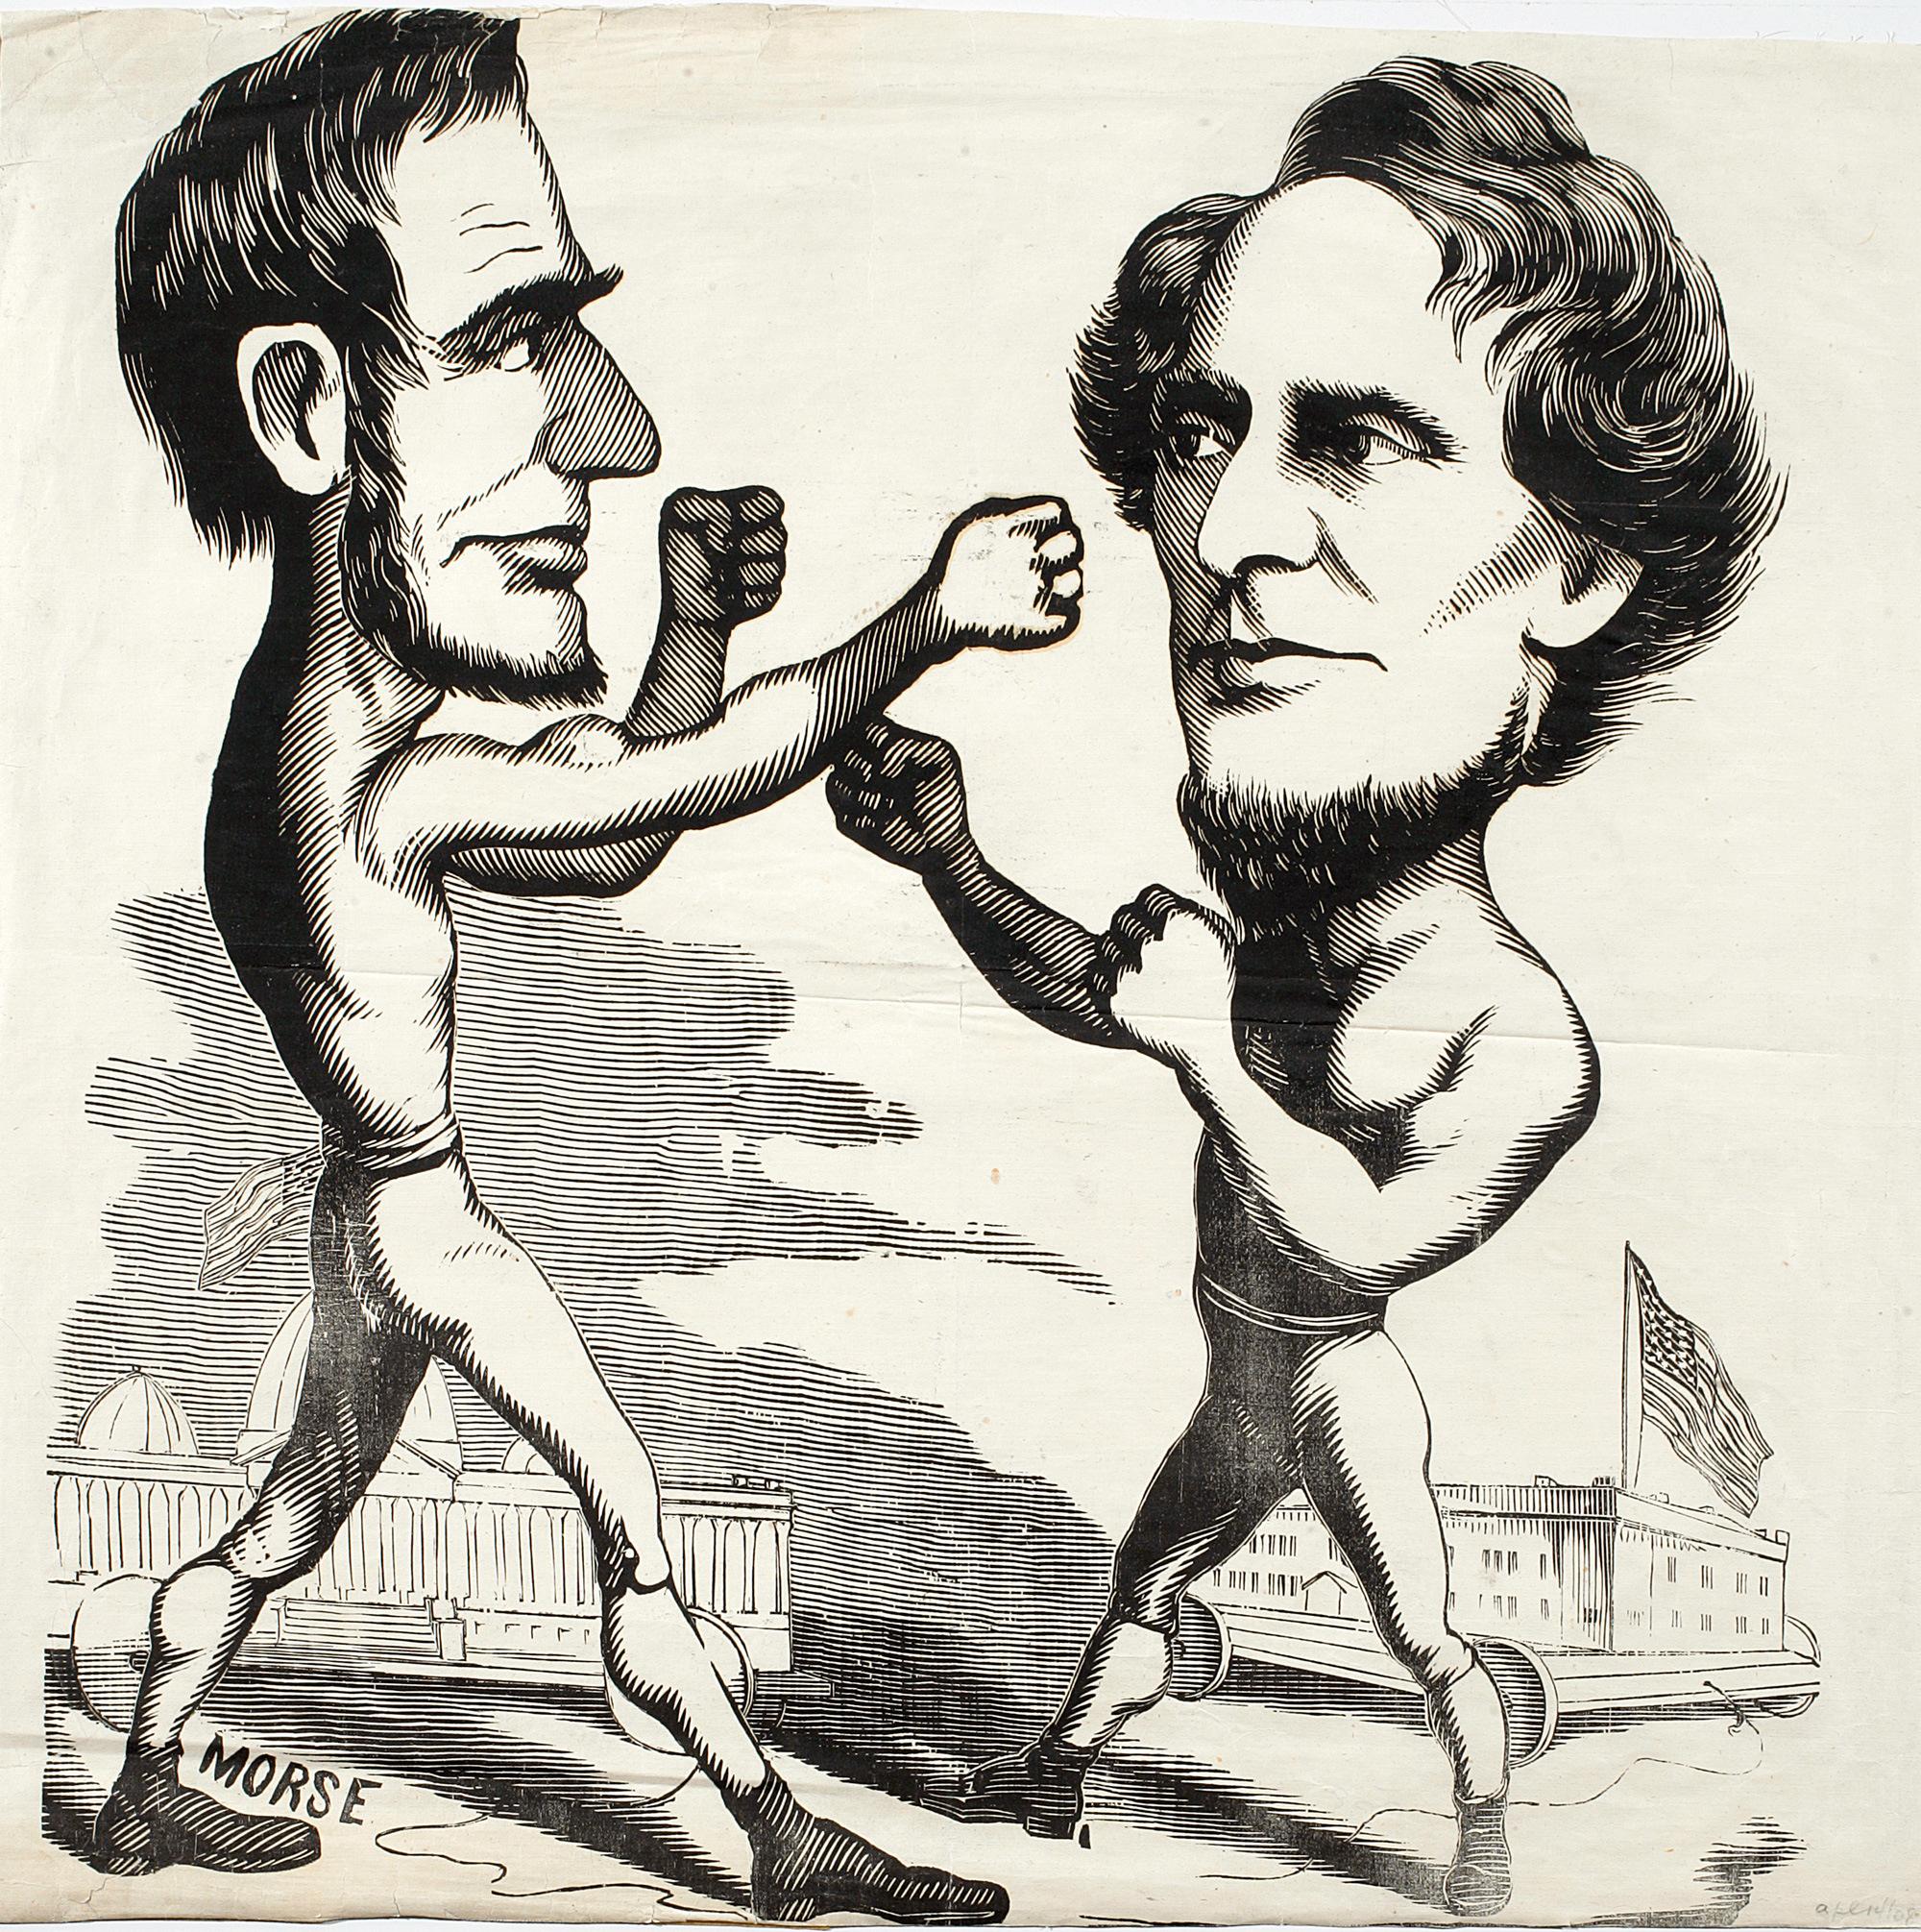 Cartoon political boxing cartoon Abraham Lincoln vs. Jefferson Davis.